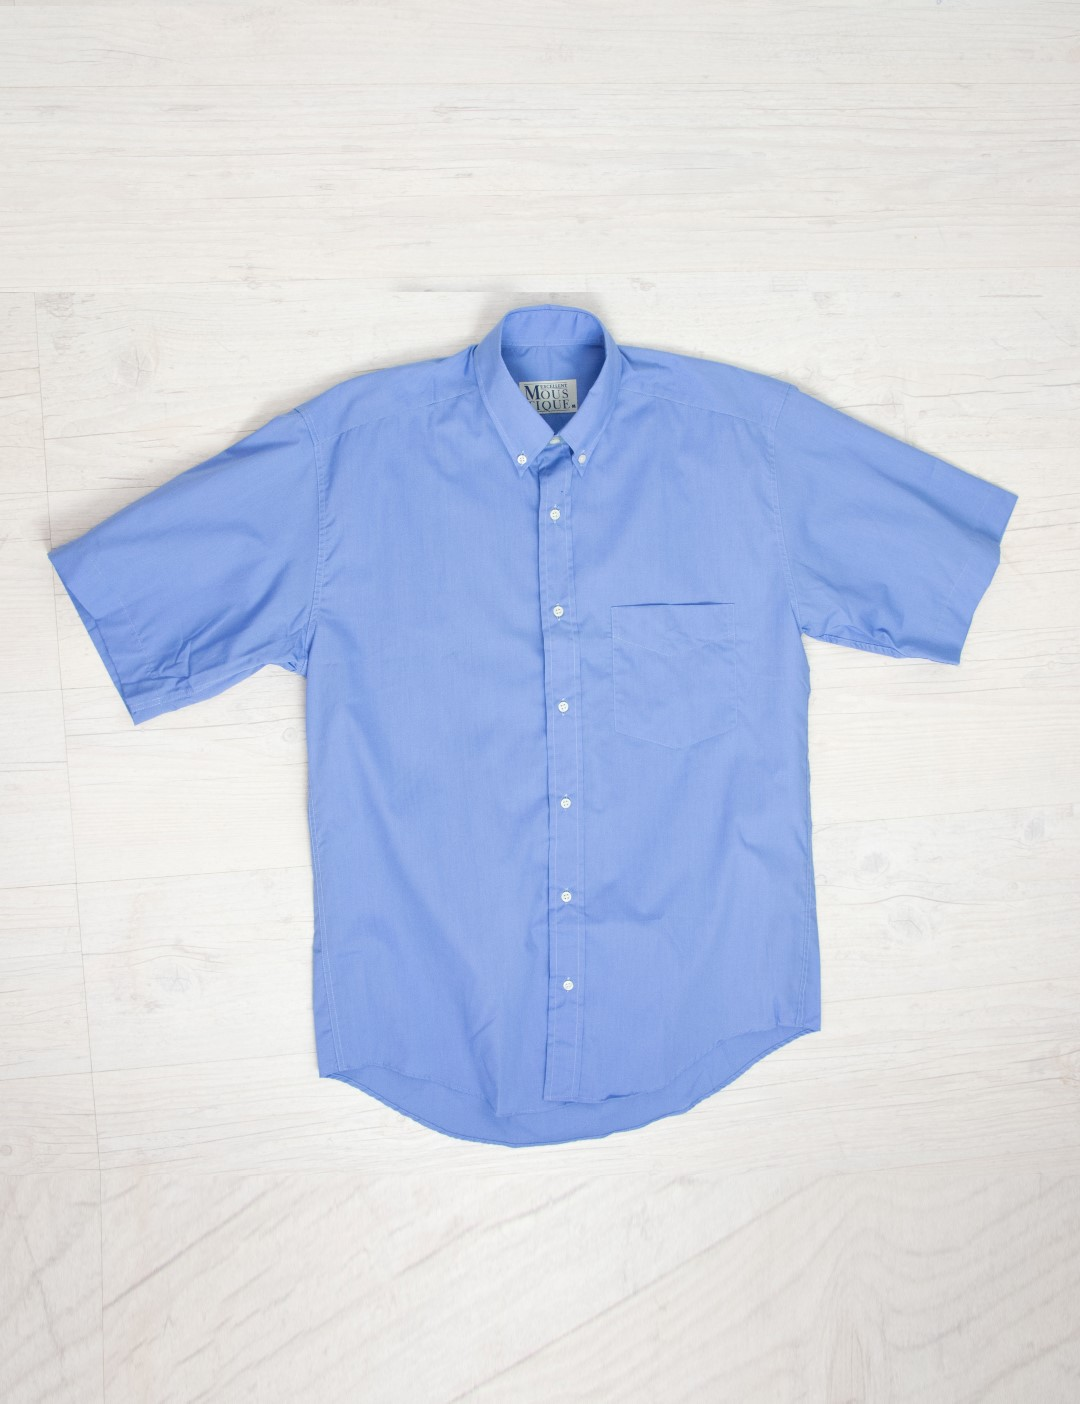 b020d9a3372 Ανδρικό κοντομάνικο πουκάμισο σιέλ 94655